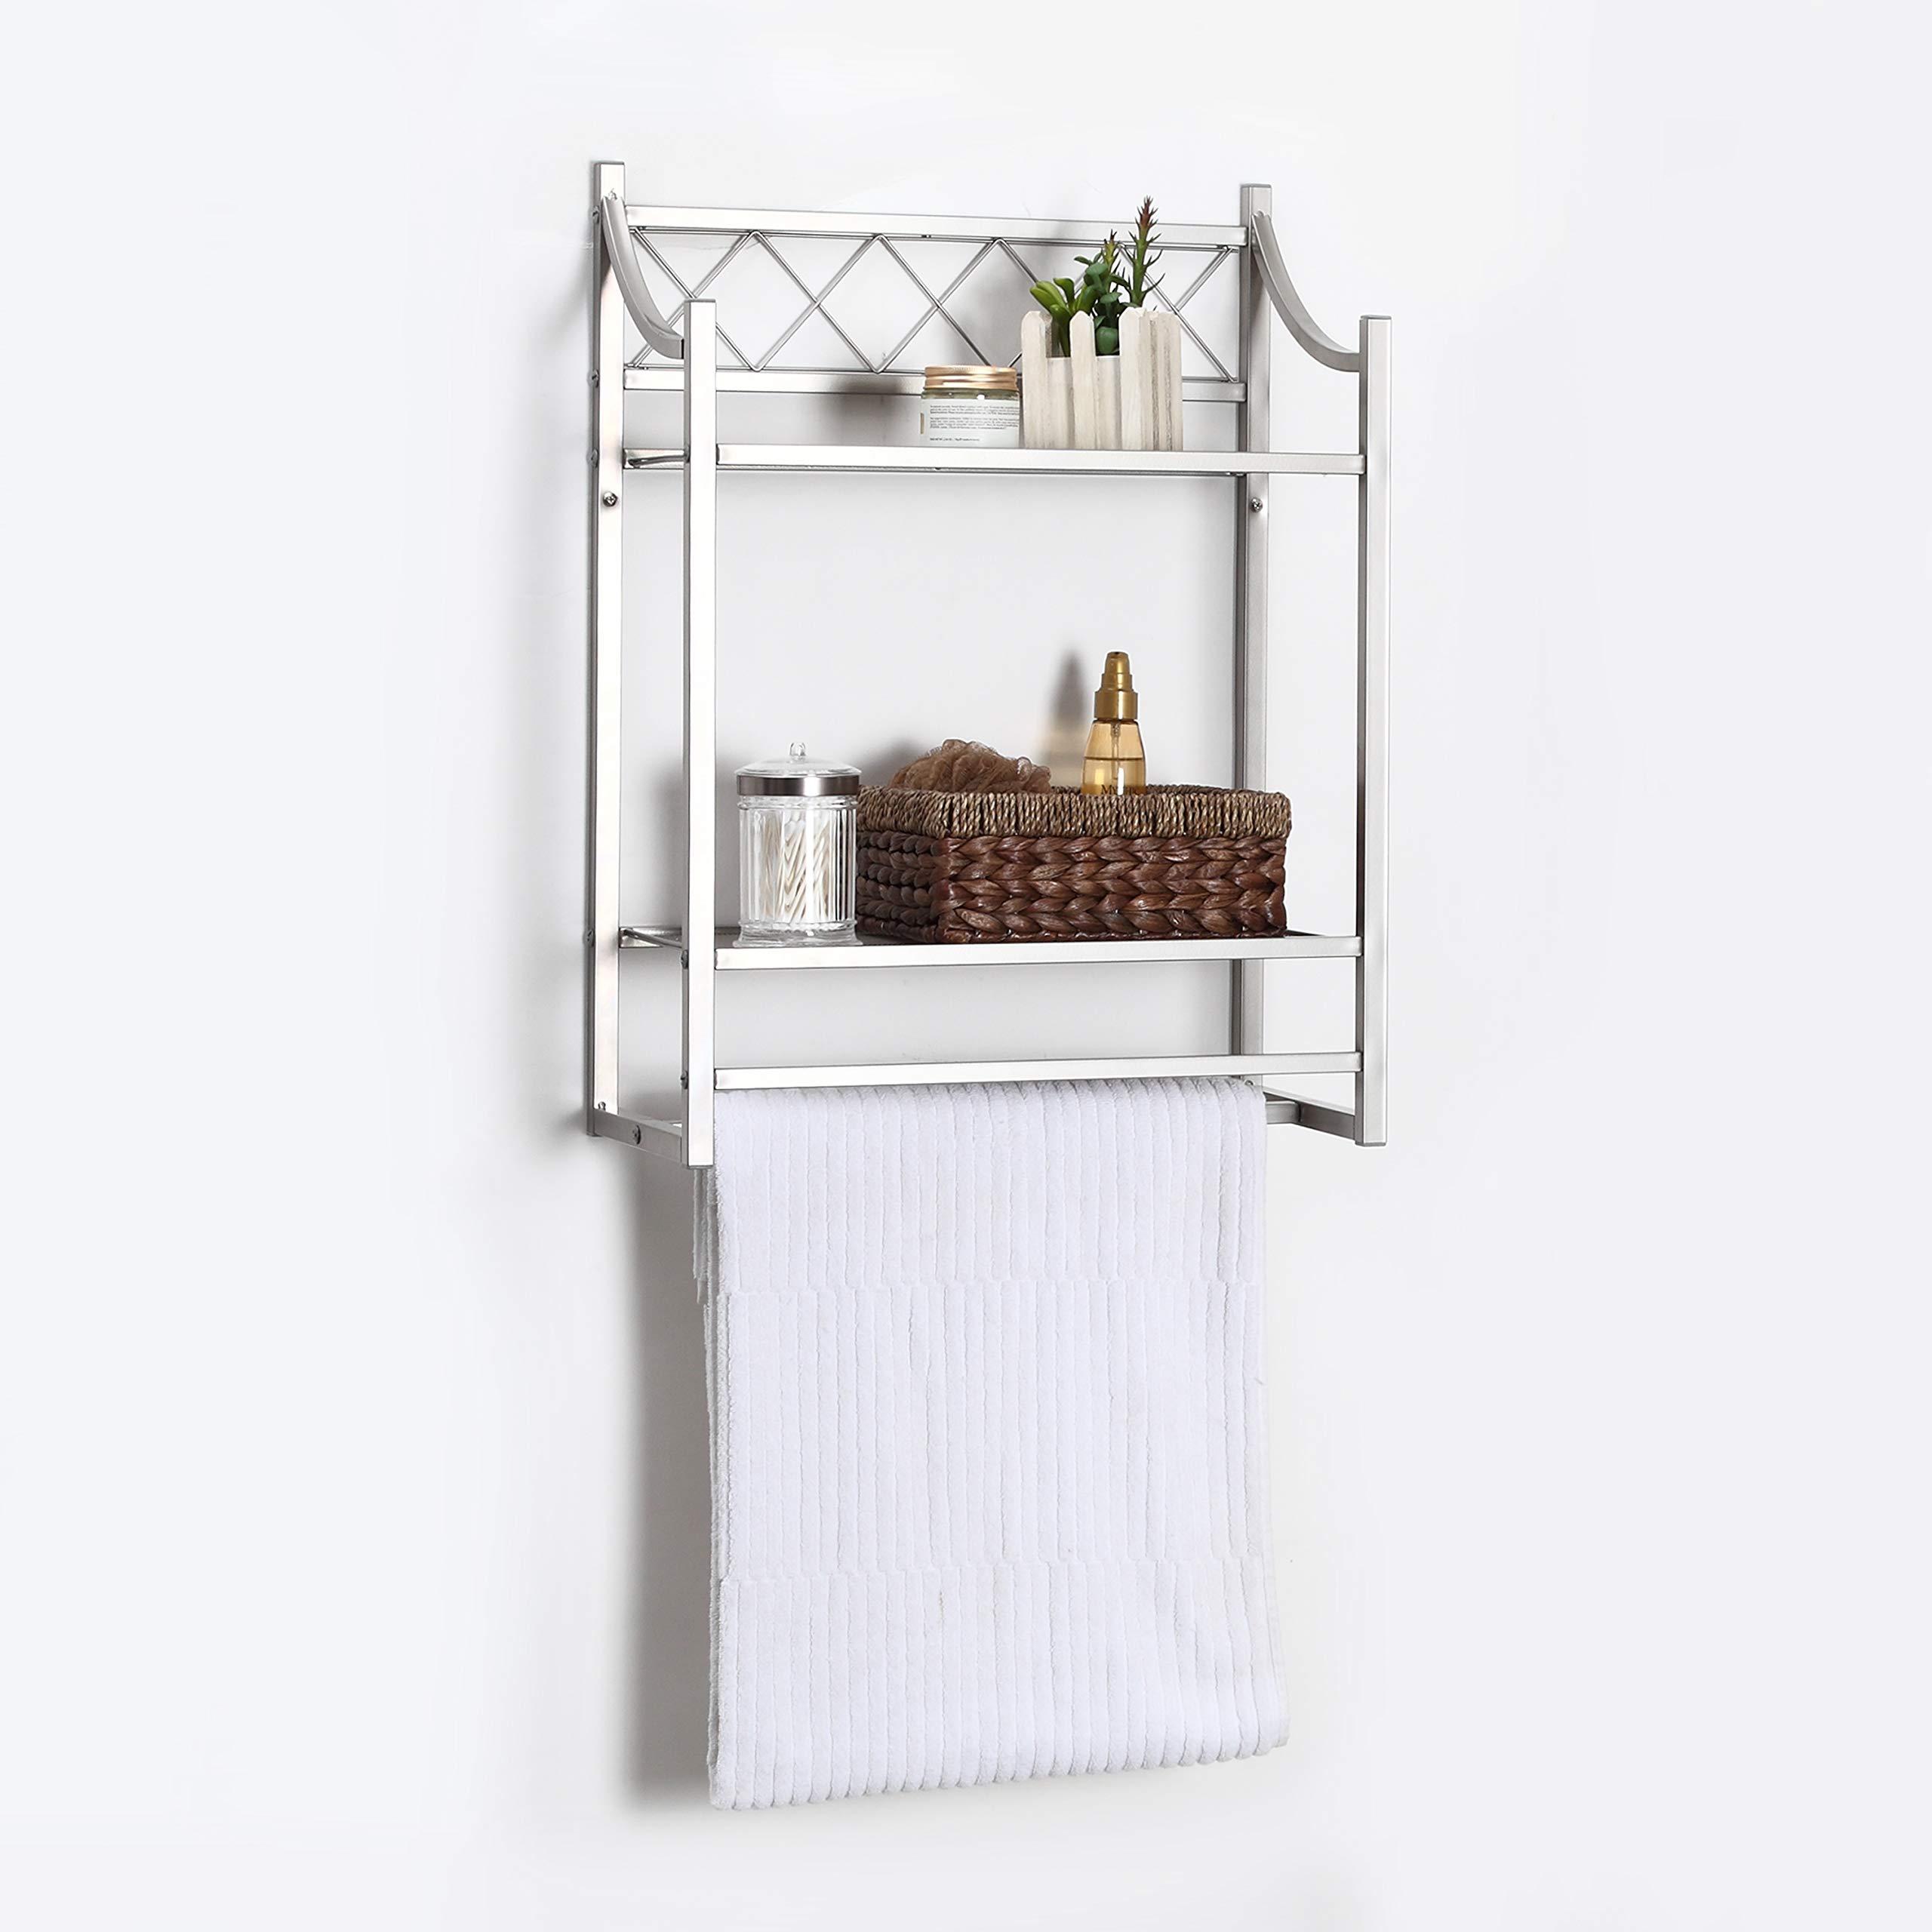 Home Zone 2 Tier Shelf Bathroom Wall Mount Organizer with Tower Bar, Mesh Shelving, Satin Nickel Finish